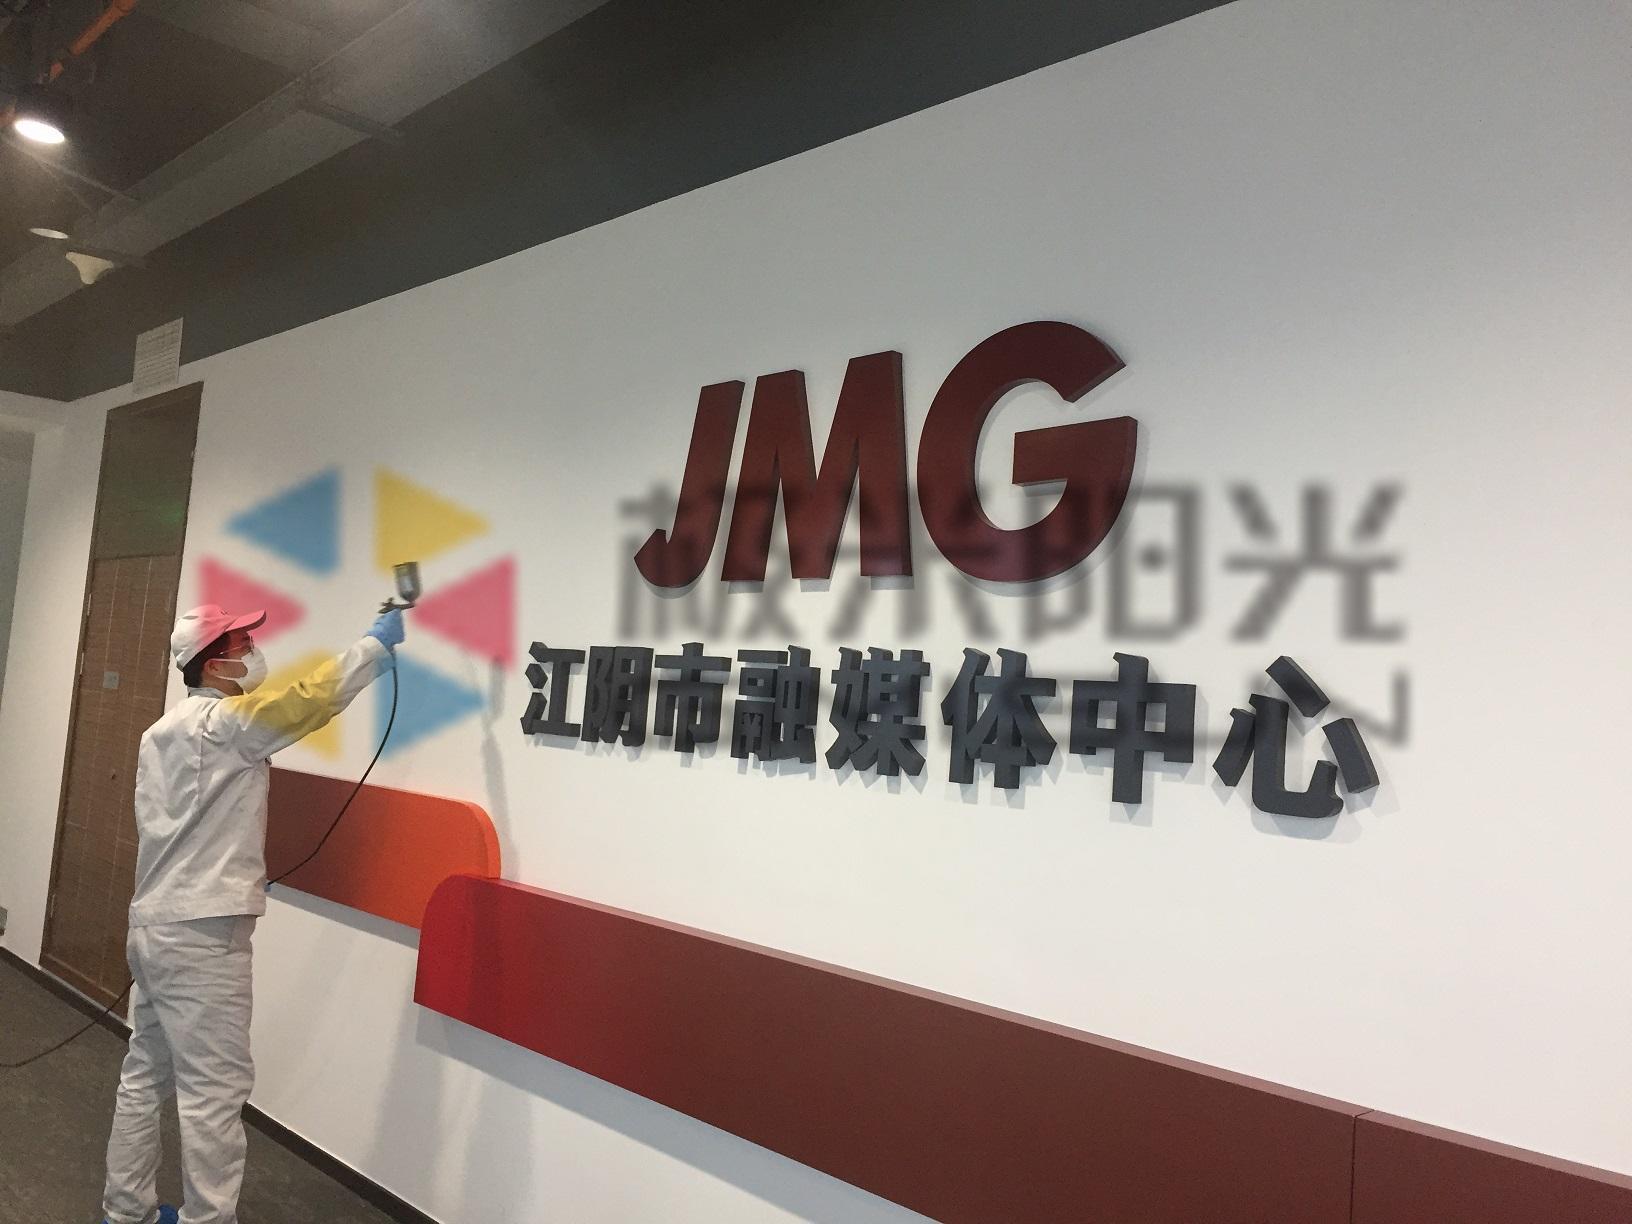 IMG_2146.JPG